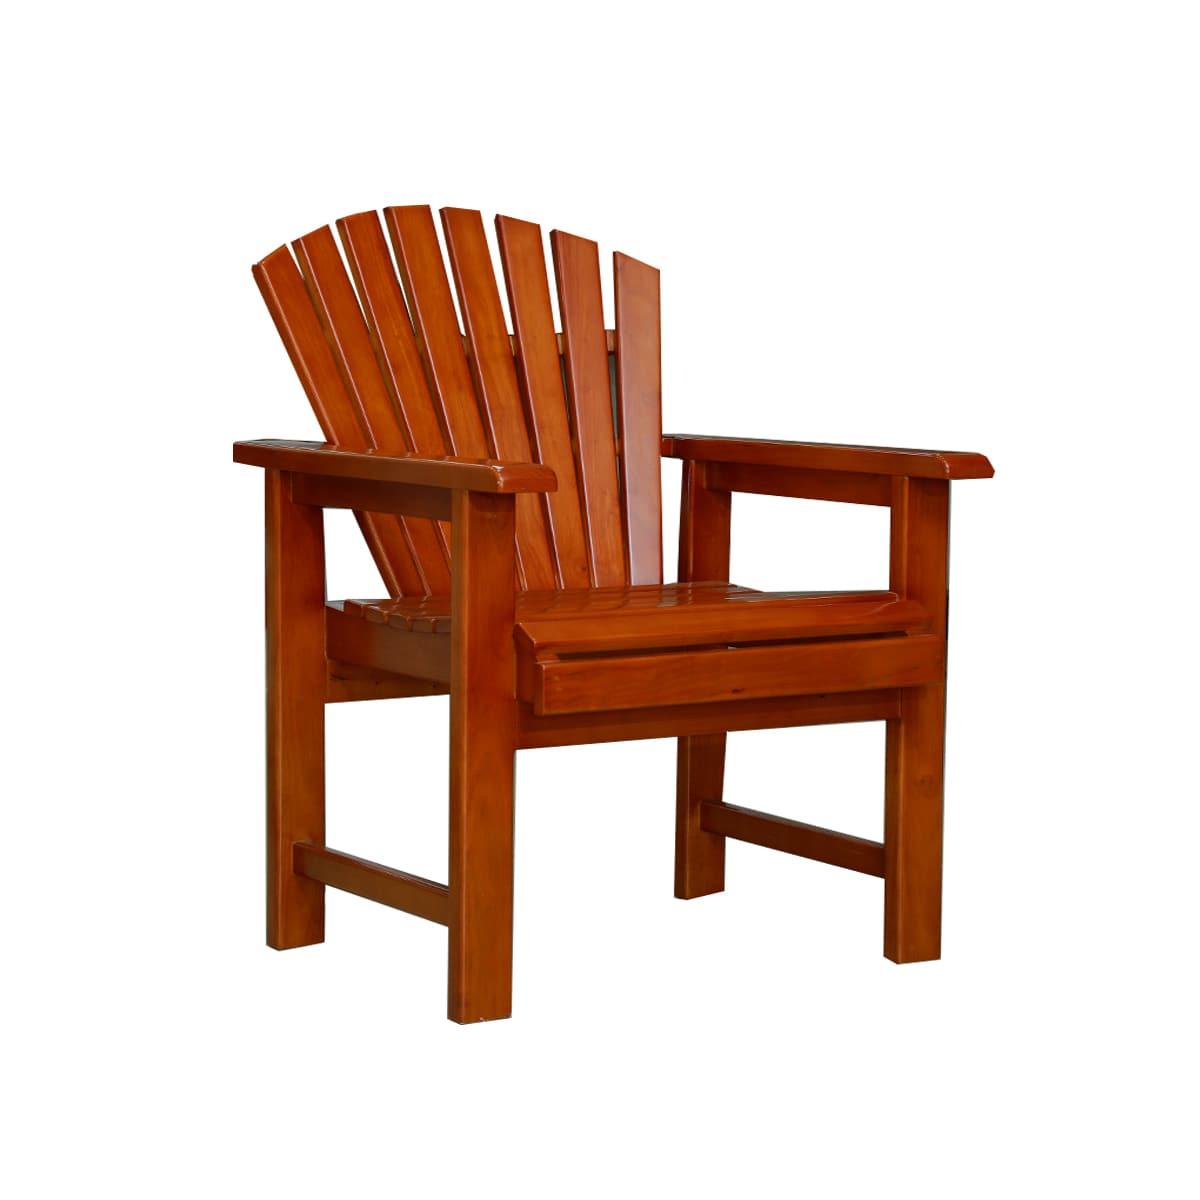 Malaysian Peacock Chair